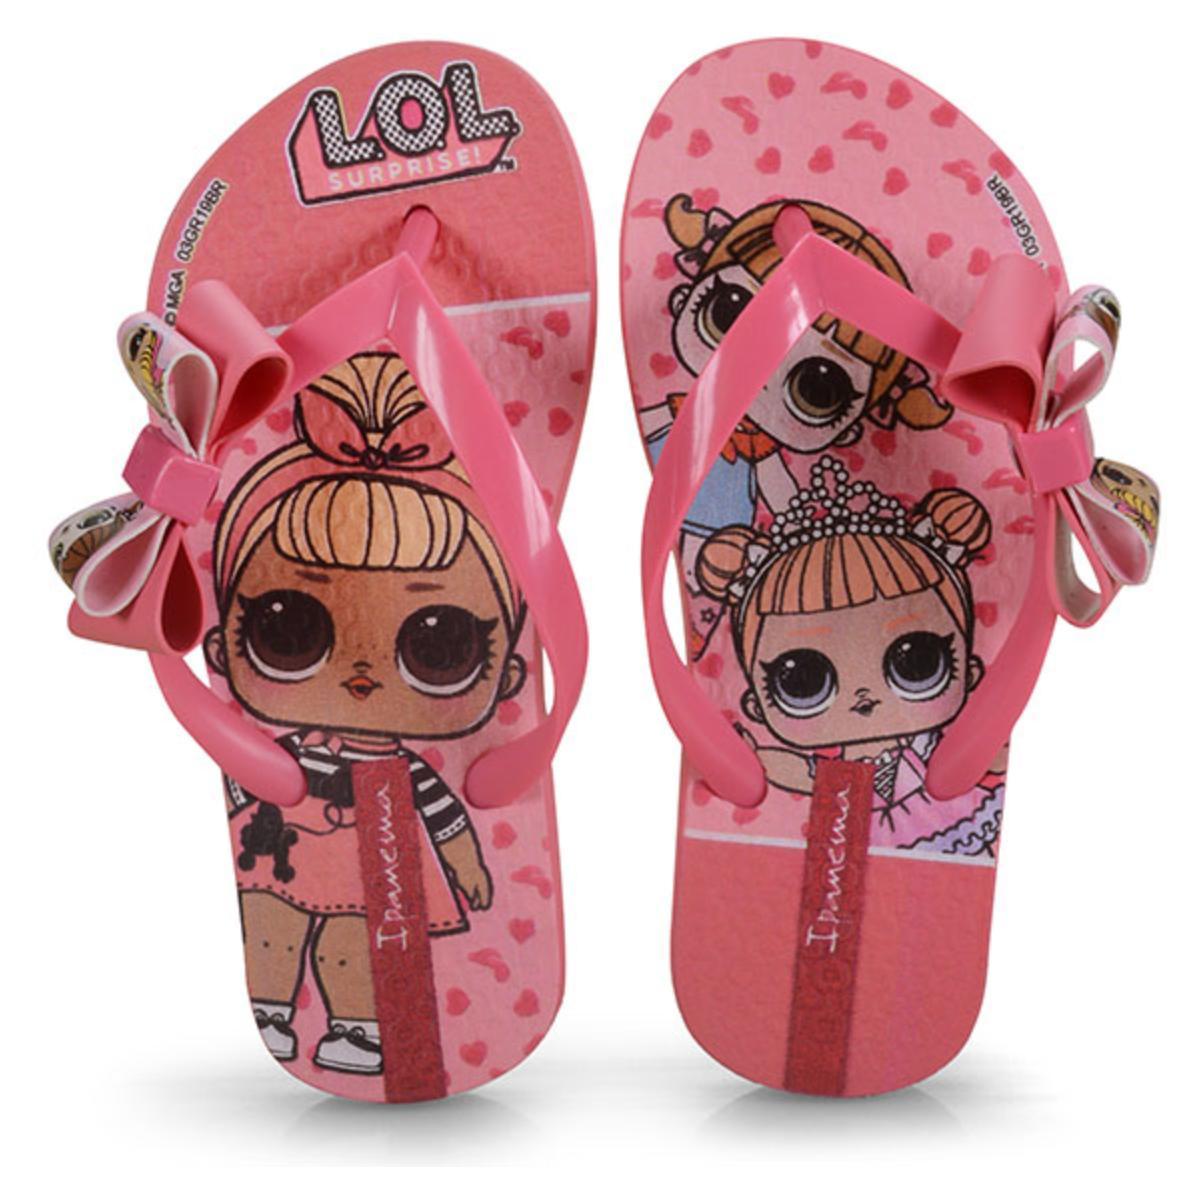 Chinelo Fem Infantil Grendene 26350 20791 Ipanema Lol Suprise Iii Rosa/rosa